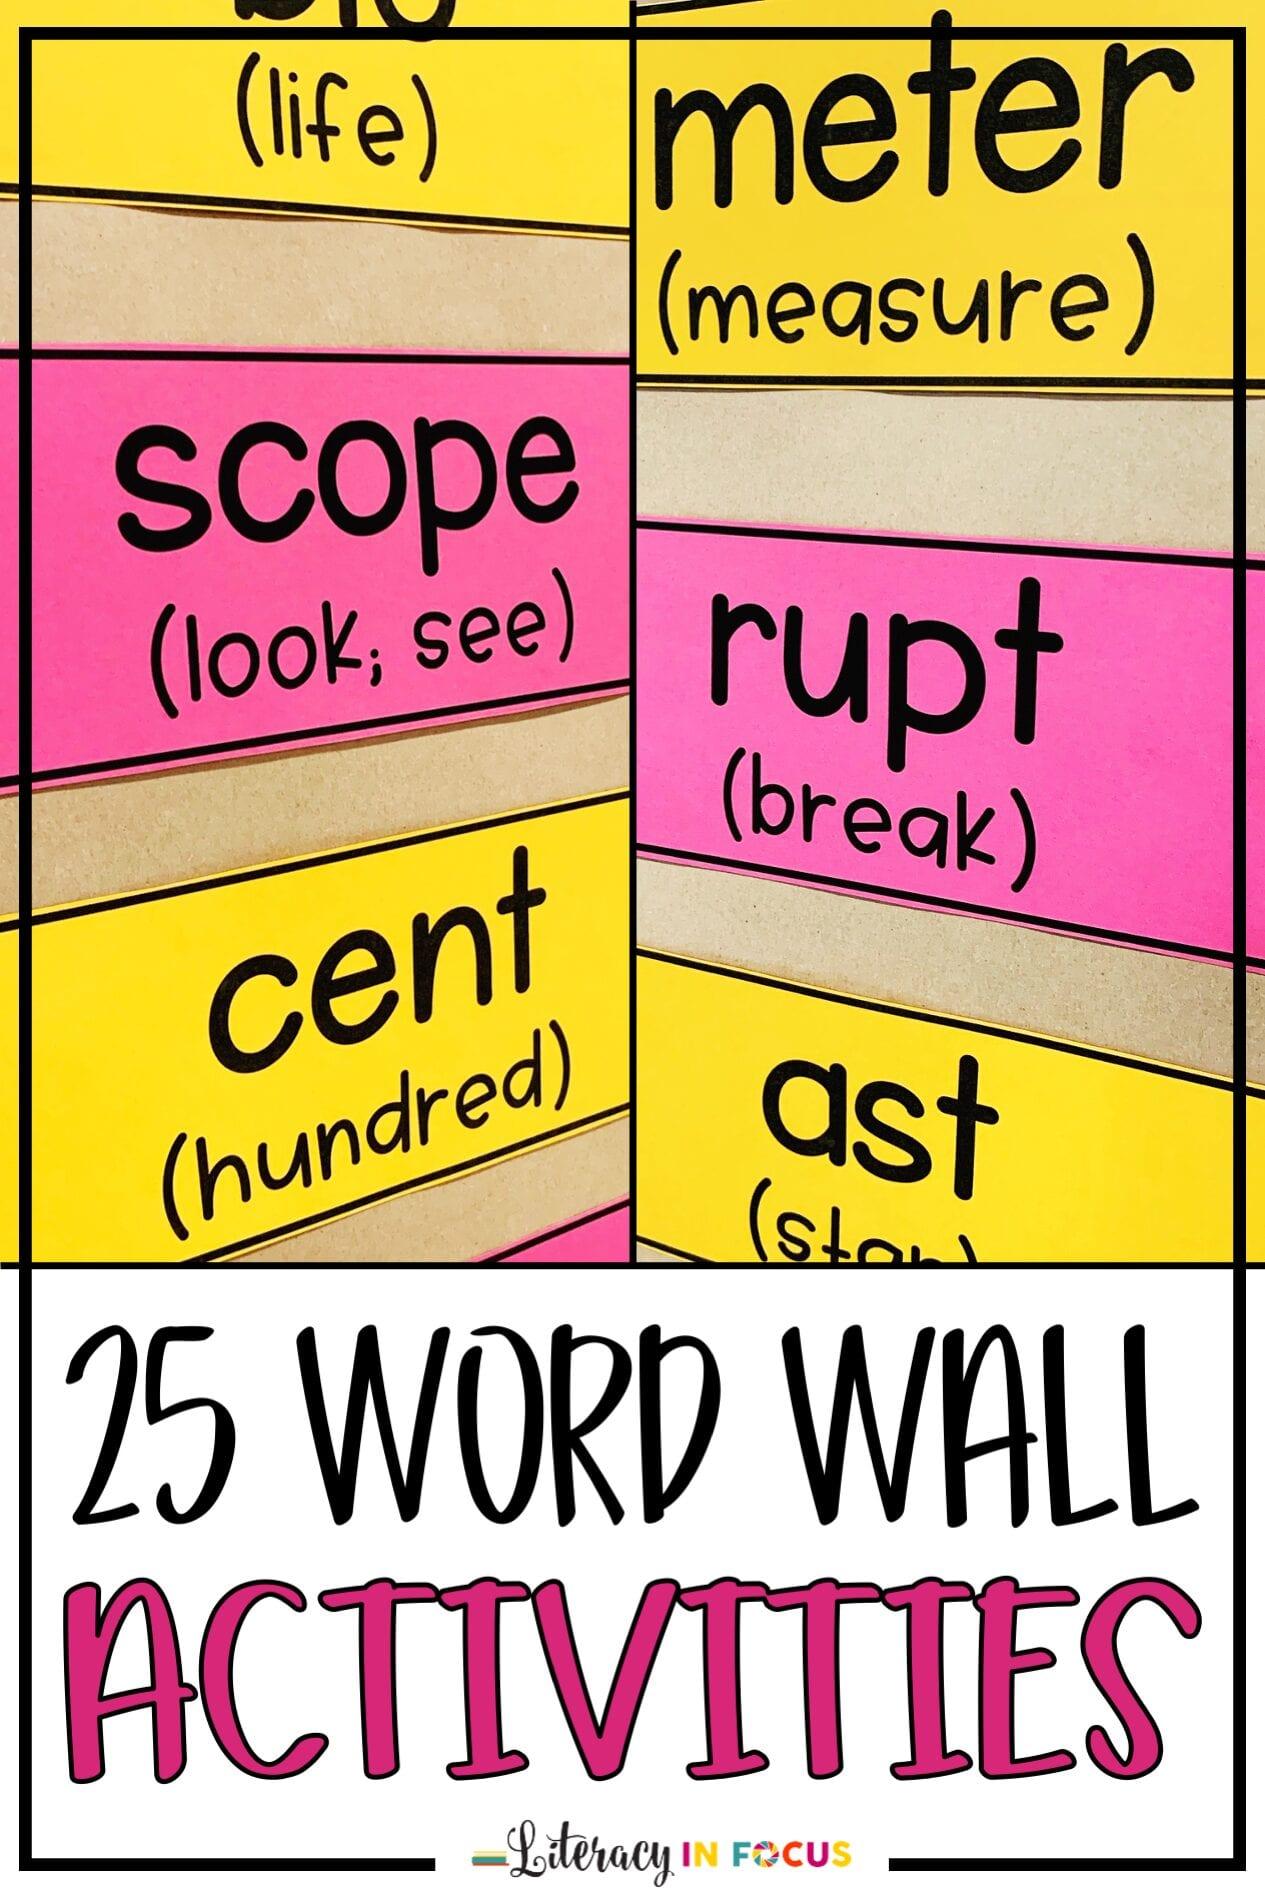 25 Word Wall Activities